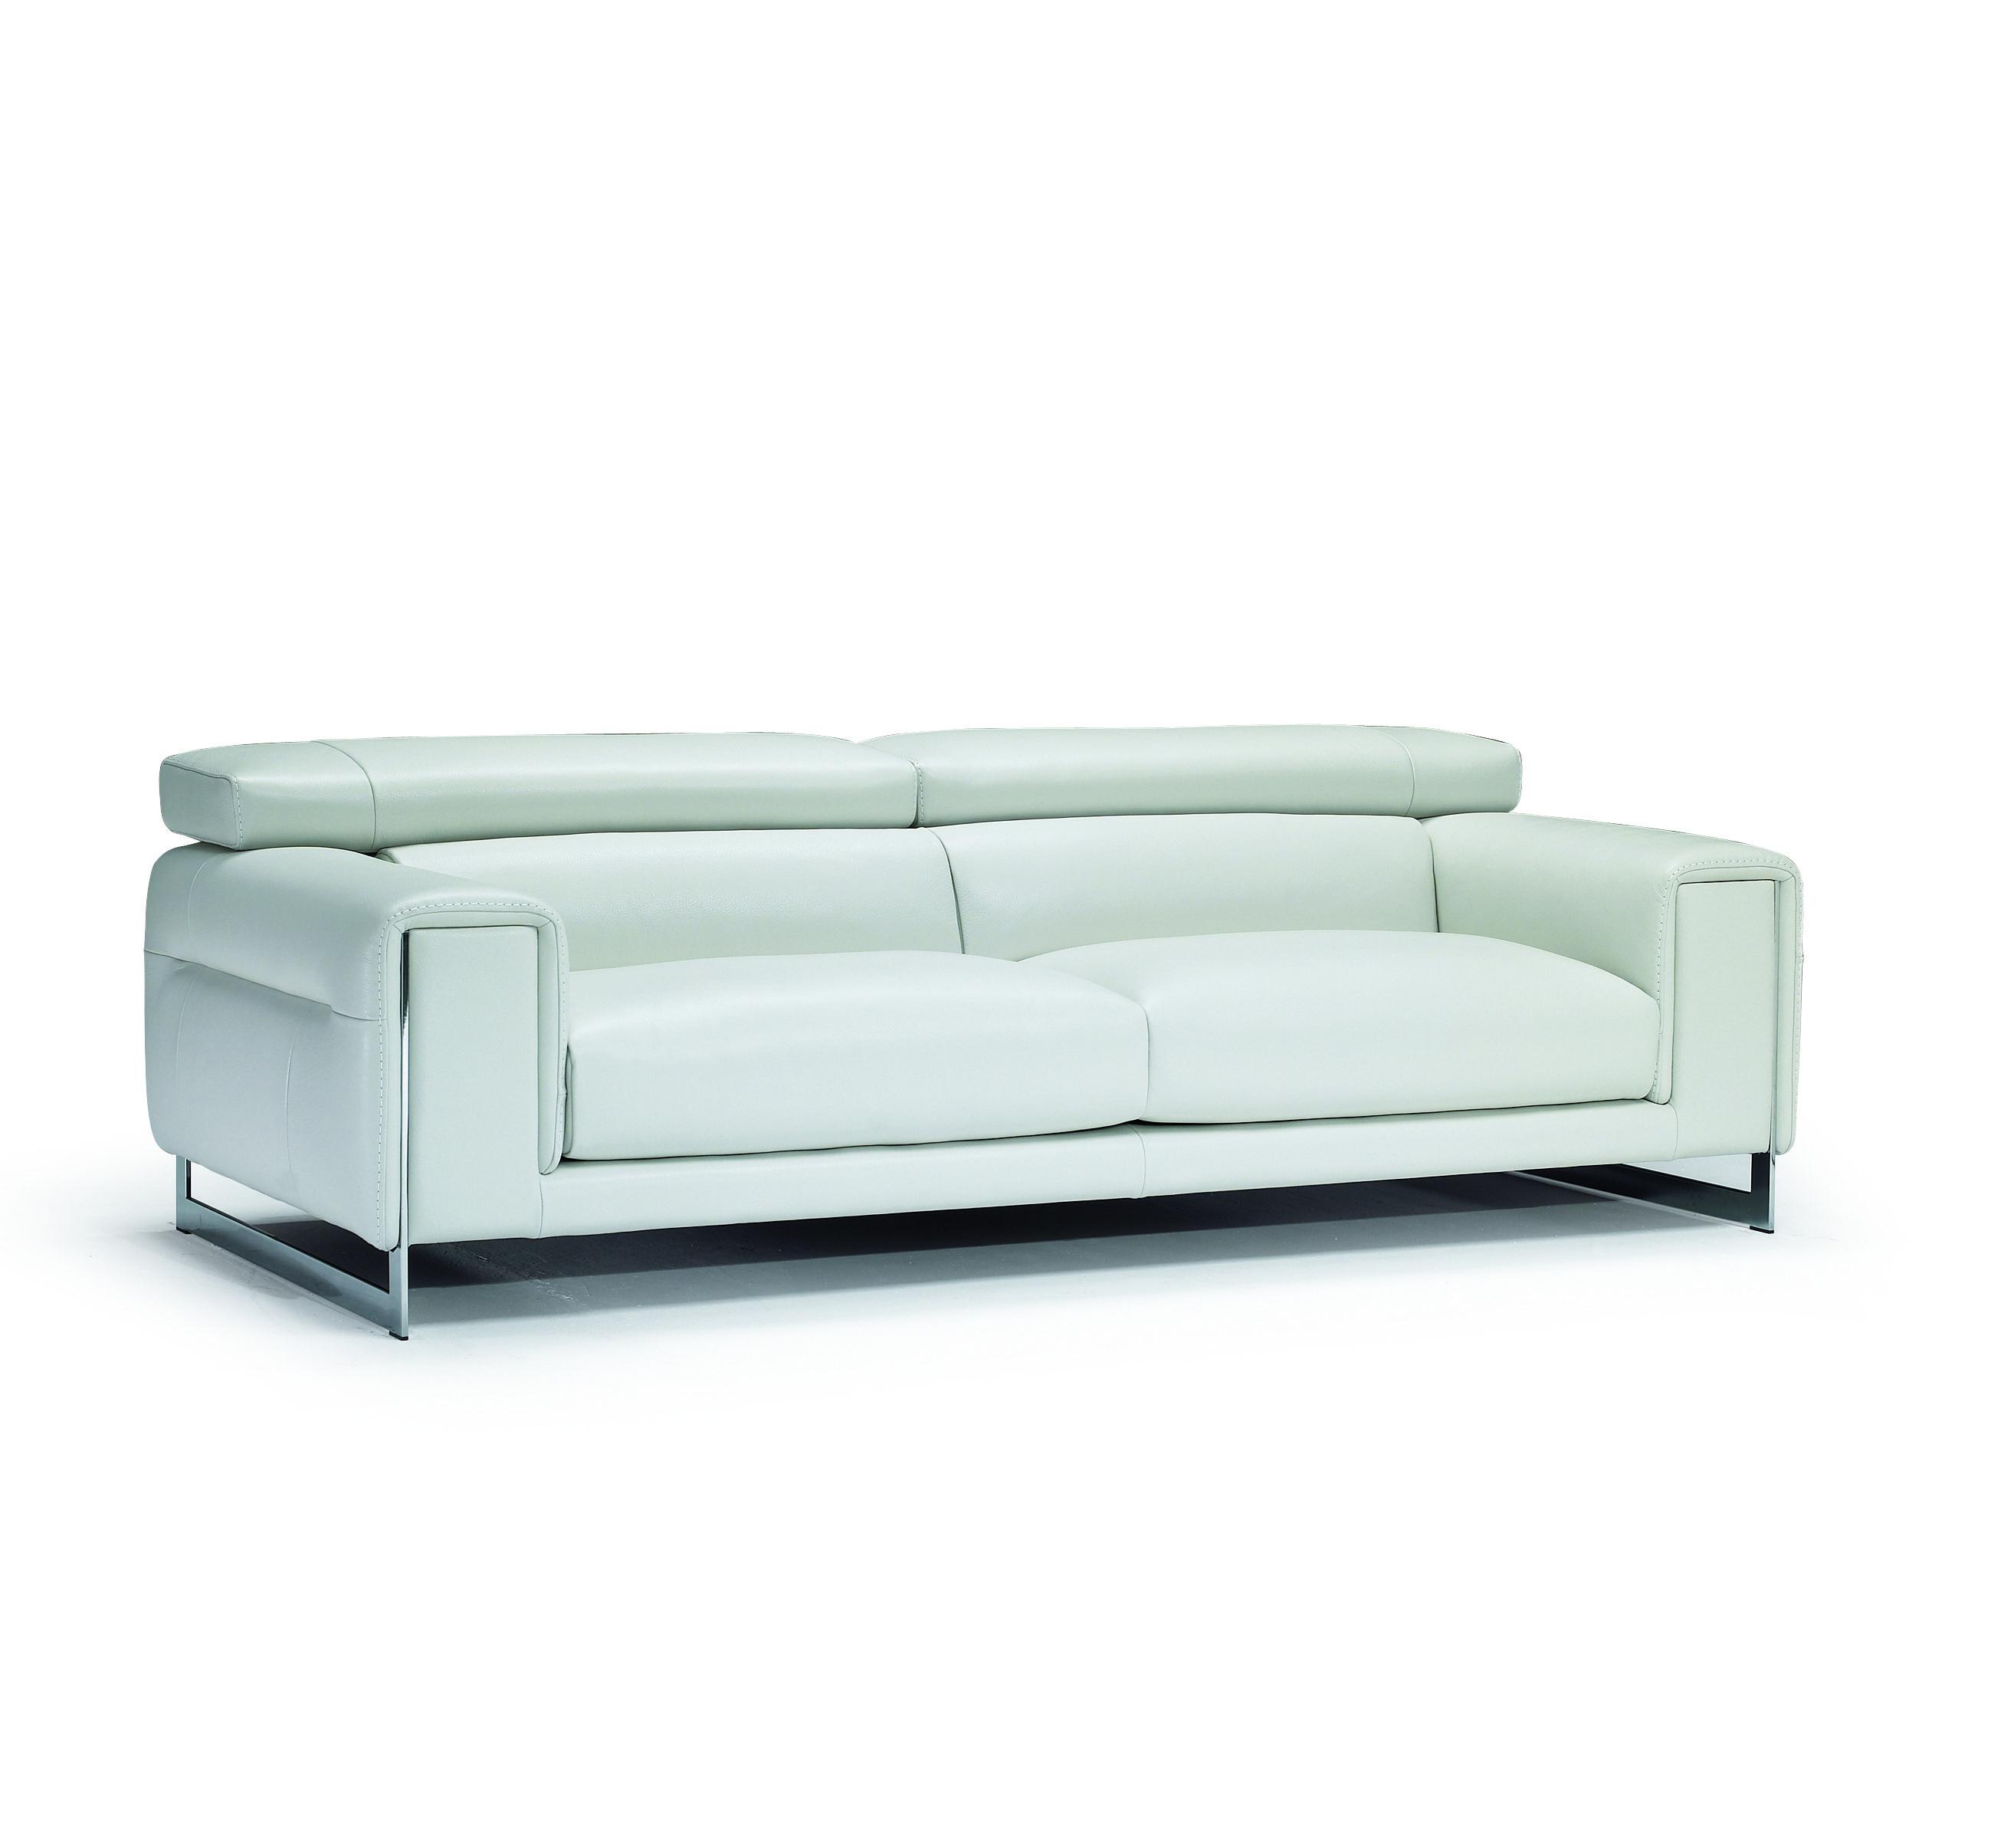 Etoile Sofa By Natuzzi Italia